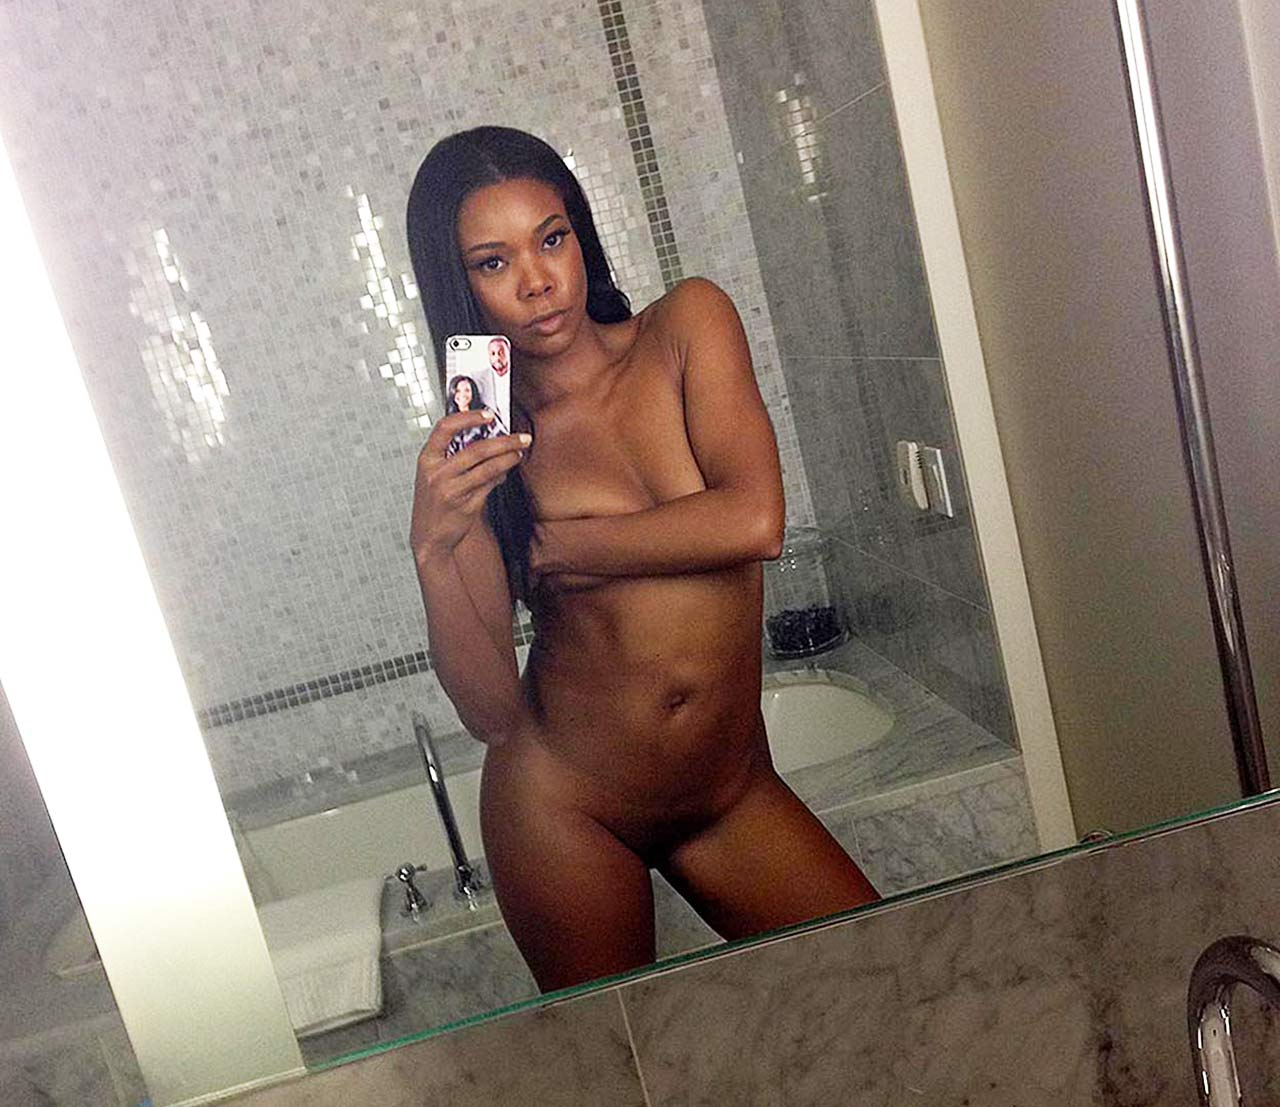 Gabrielle union leaked nudes